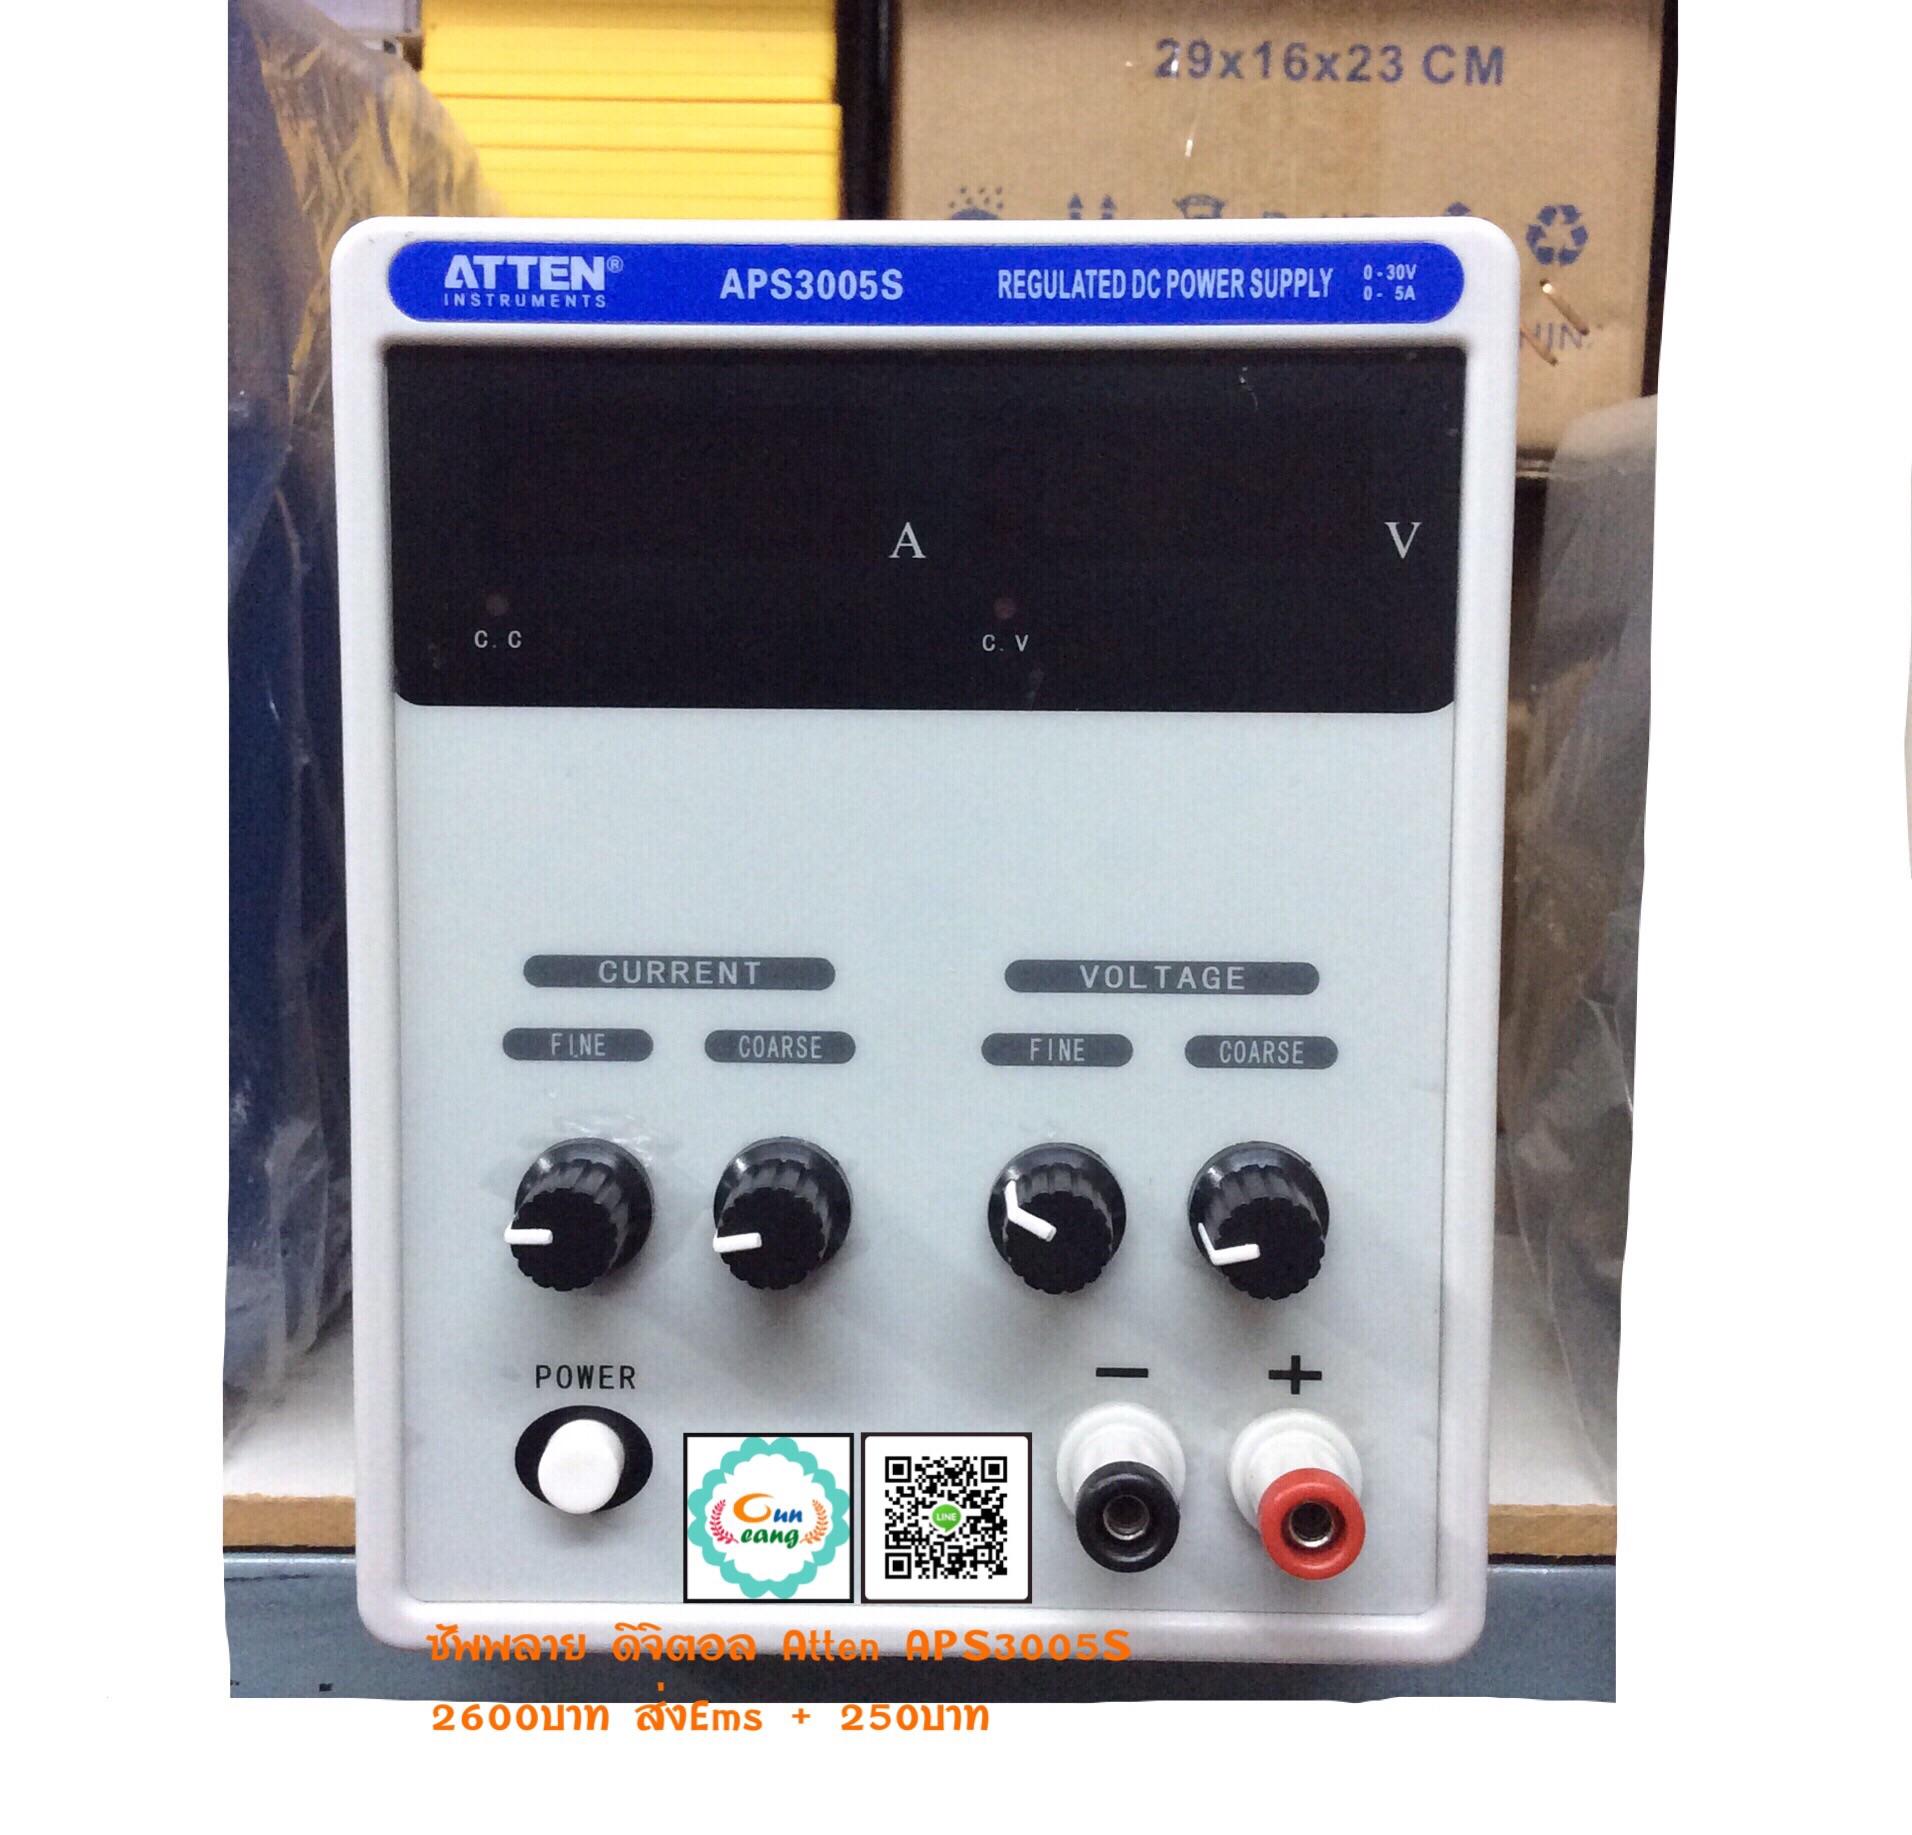 Suppy ซัพพลาย ดิจิตอล ATTEN APS3005S